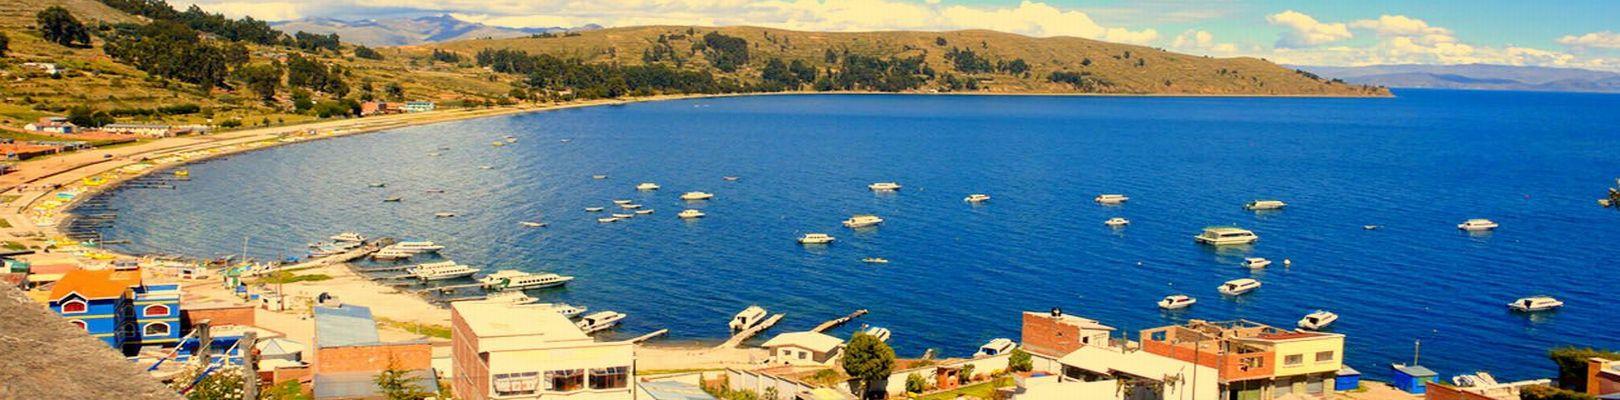 voyage pérou bolivie - Copacabana lac titicaca